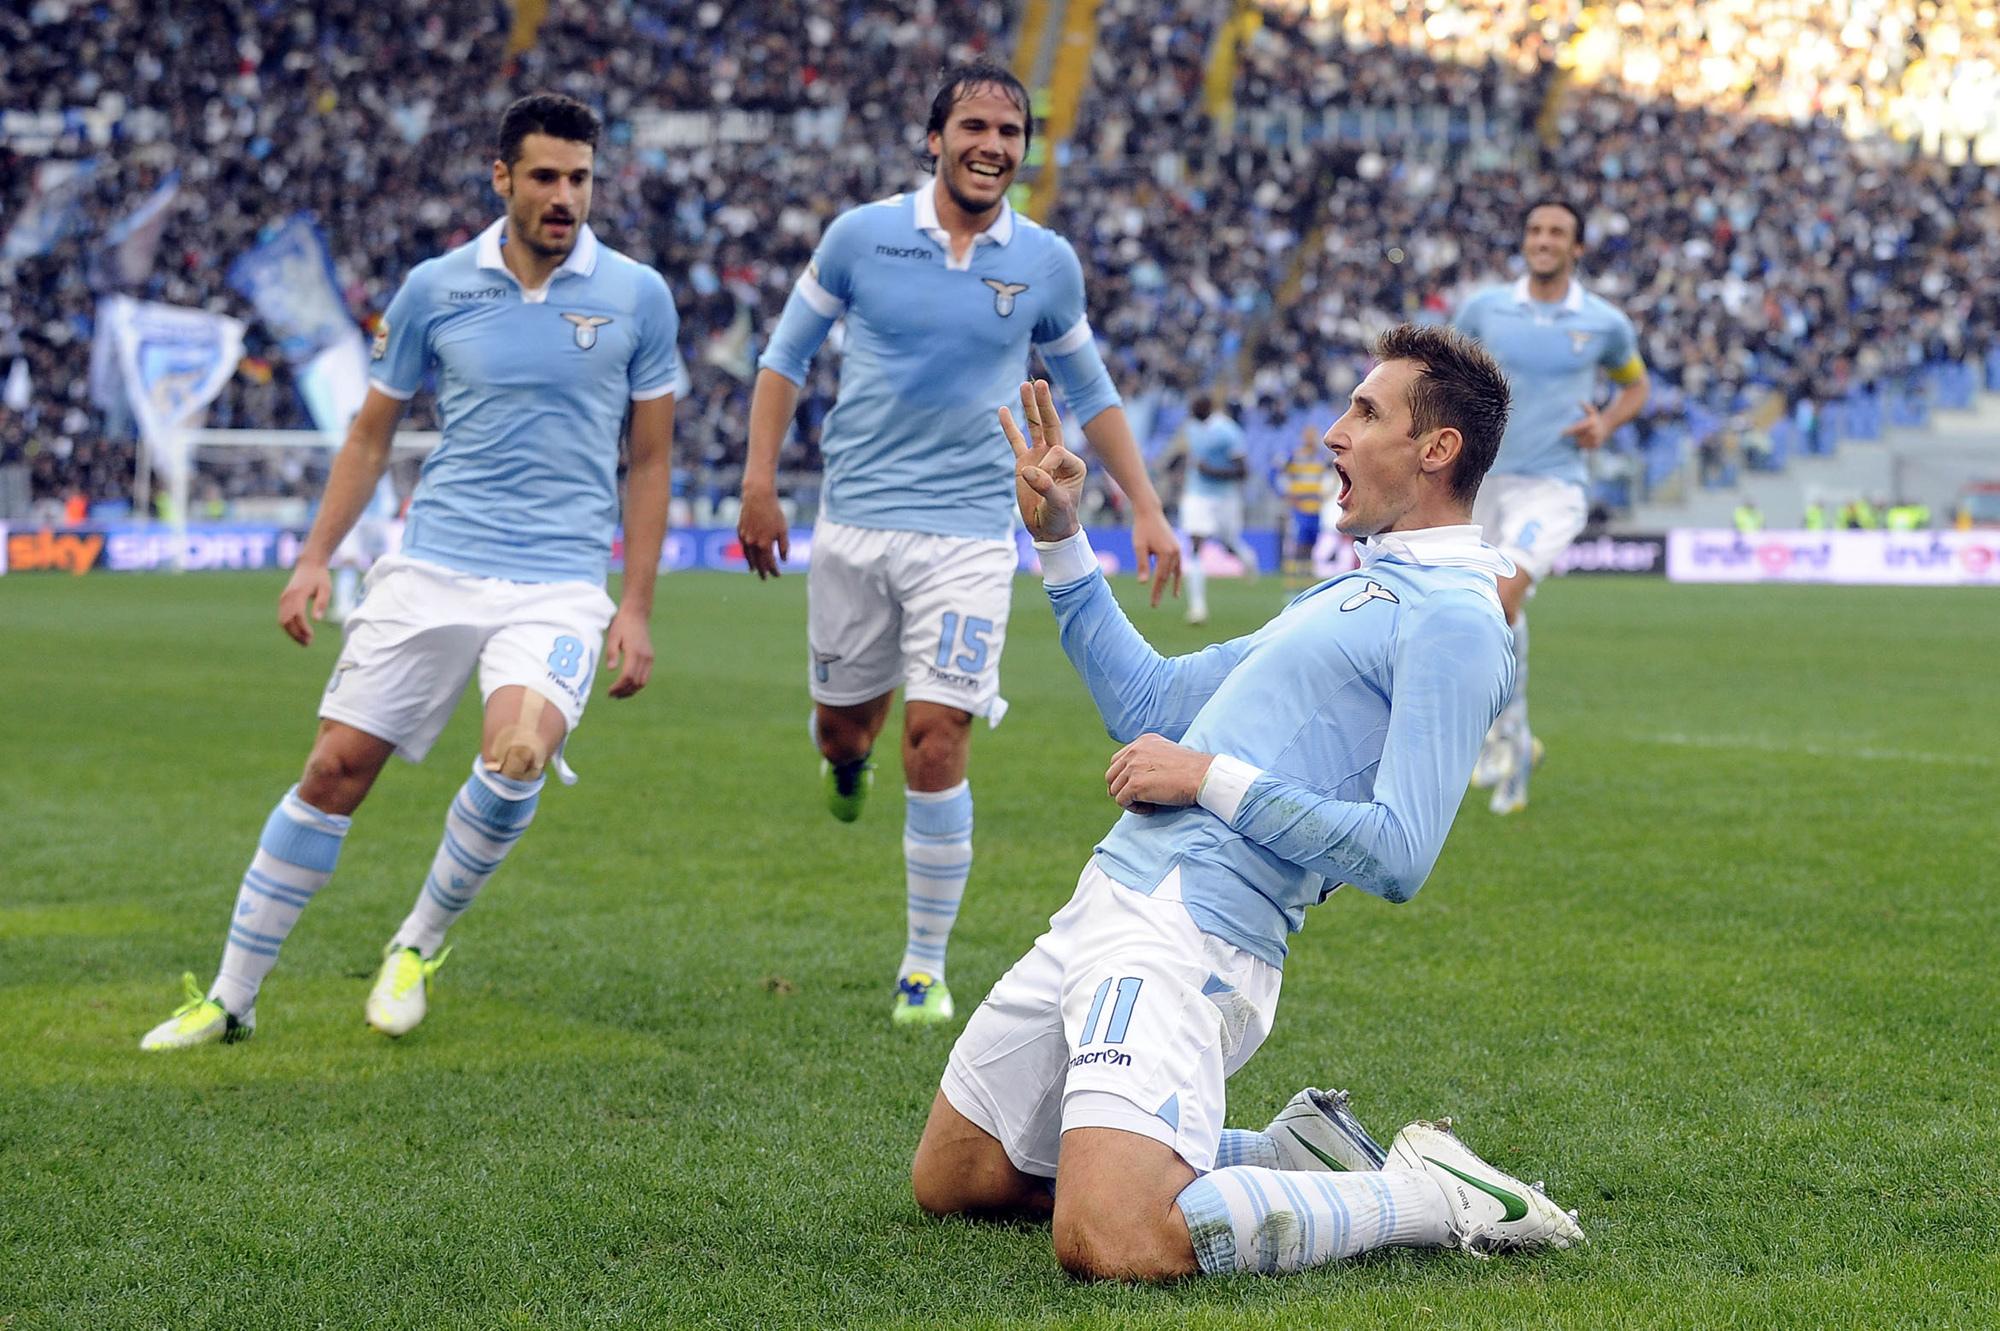 _Lazio_Miroslav_Klose_scored_a_goal_049712_